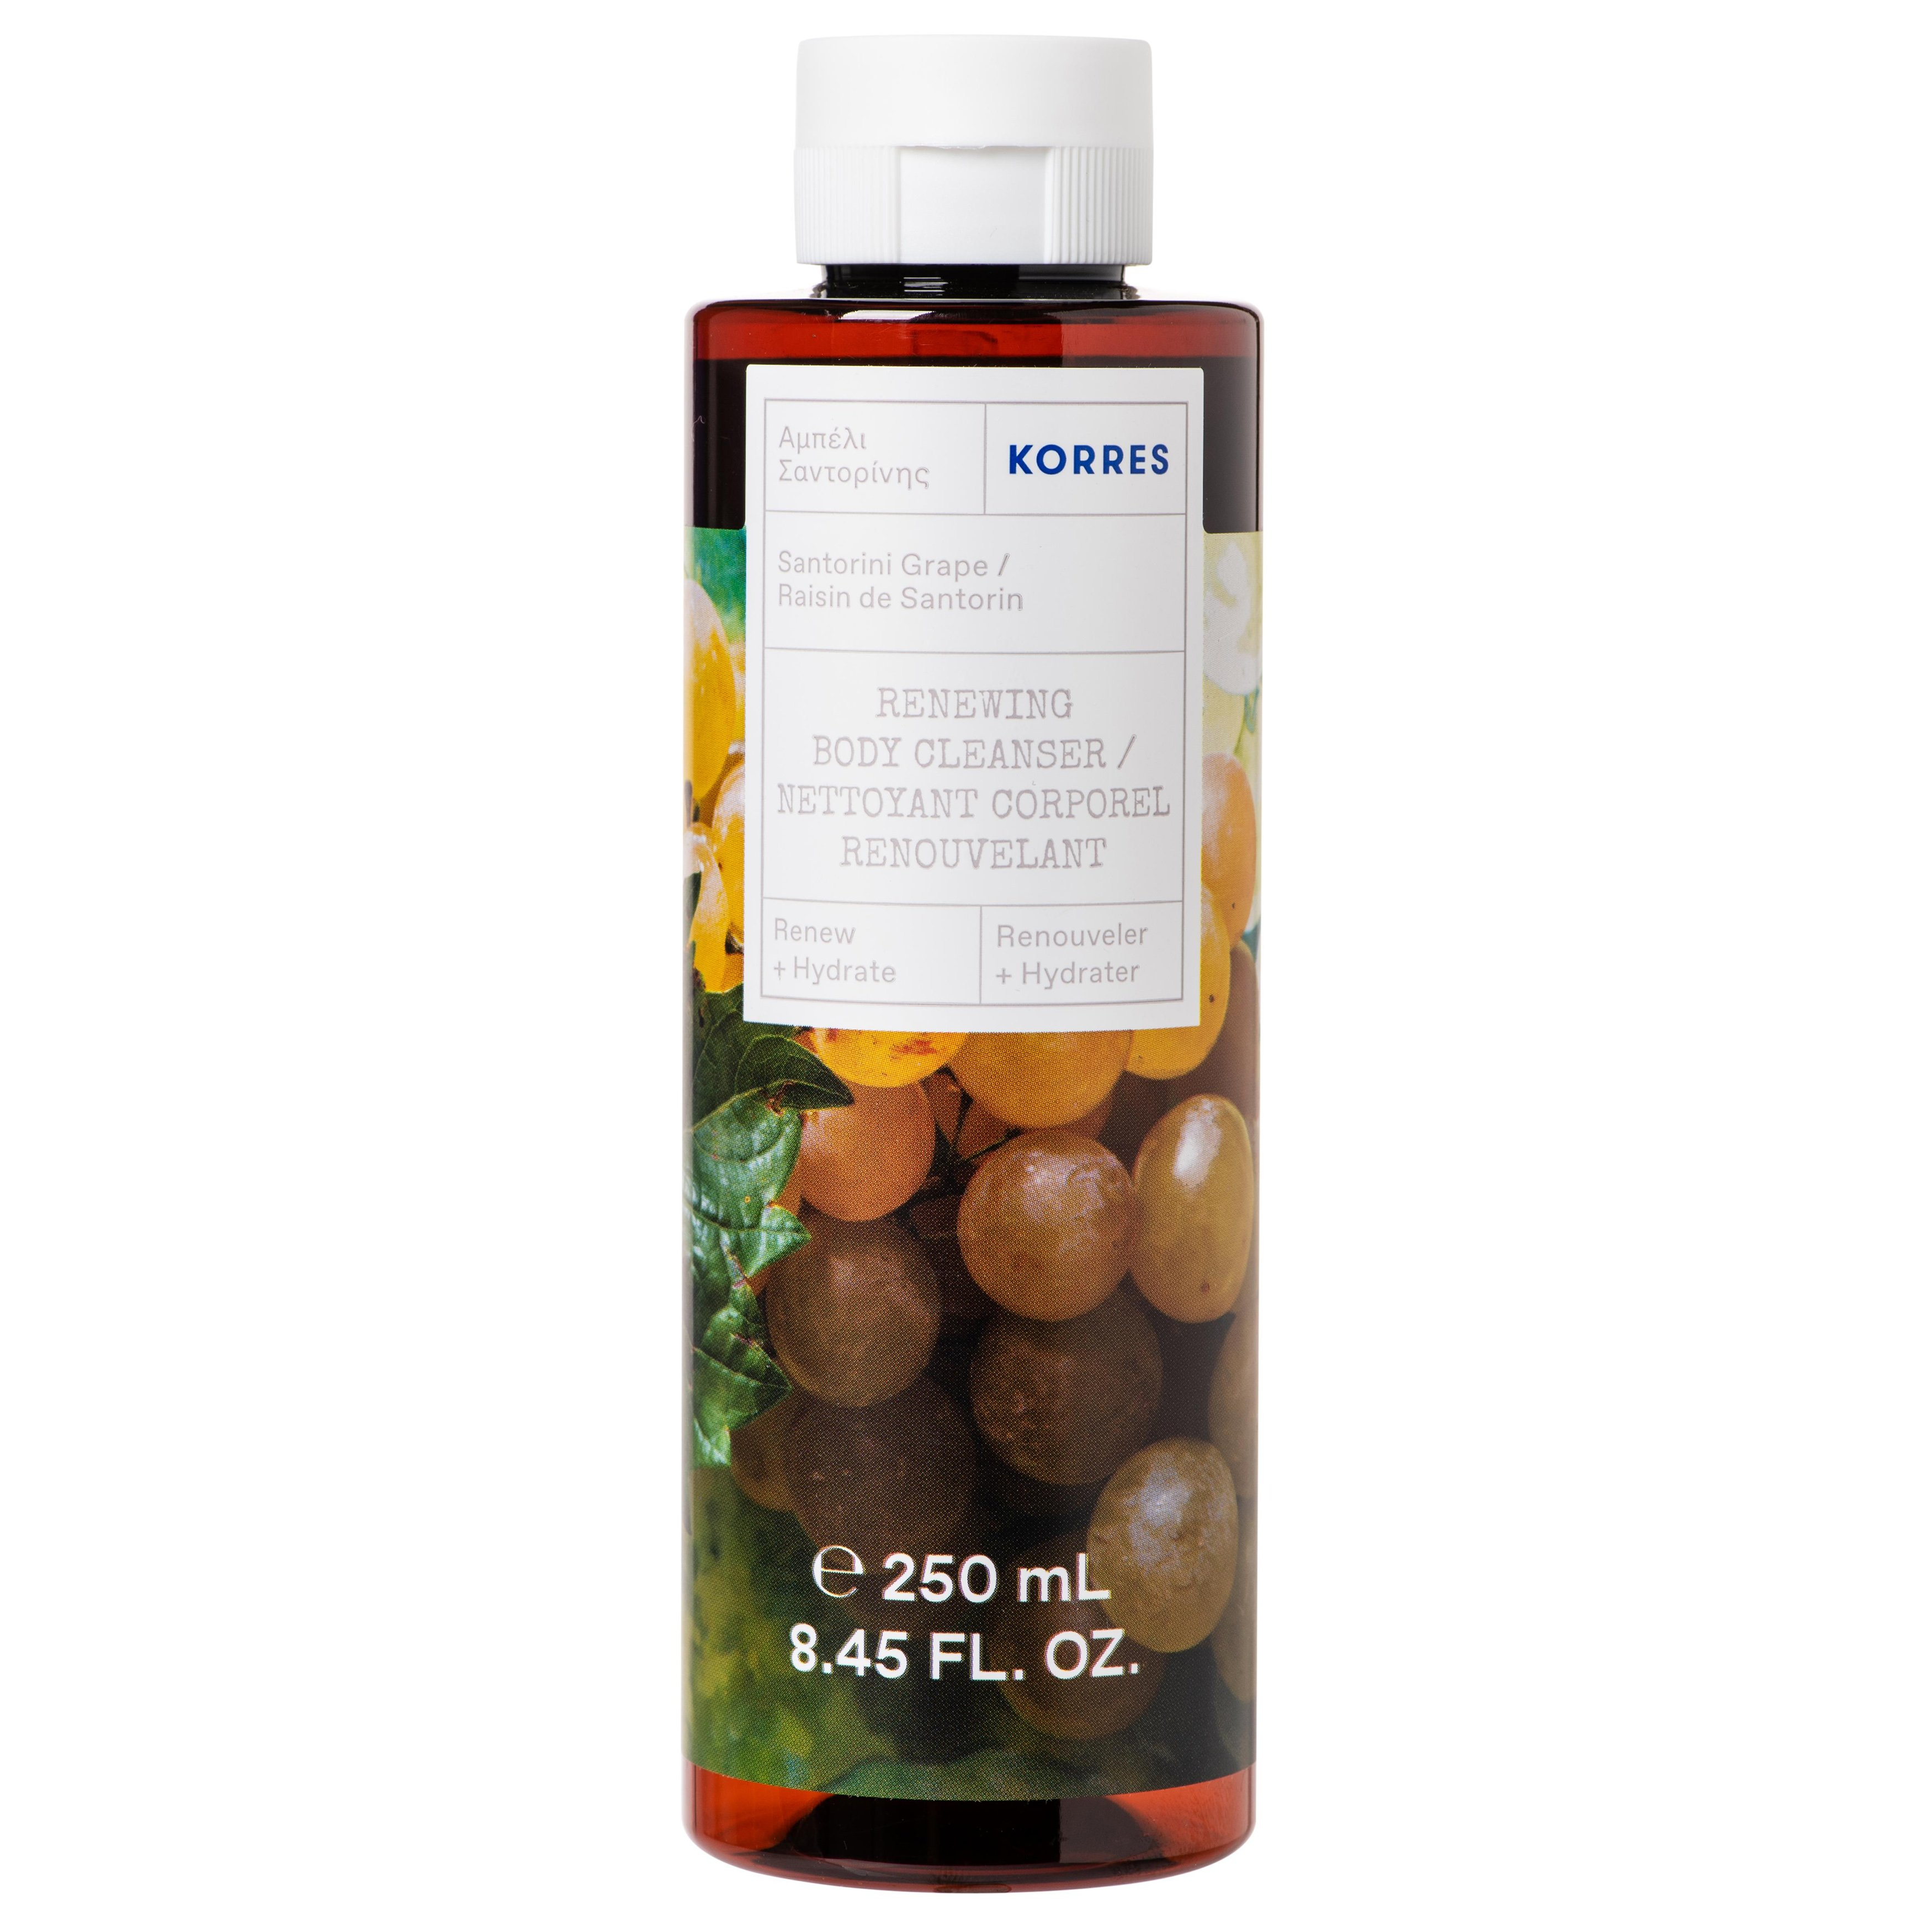 Korres Santorini Grape Body Cleanser Ενυδατικό Αφρόλουτρο με Φρέσκο, Φρουτώδες Άρωμα Αμπέλι Σαντορίνης 250ml